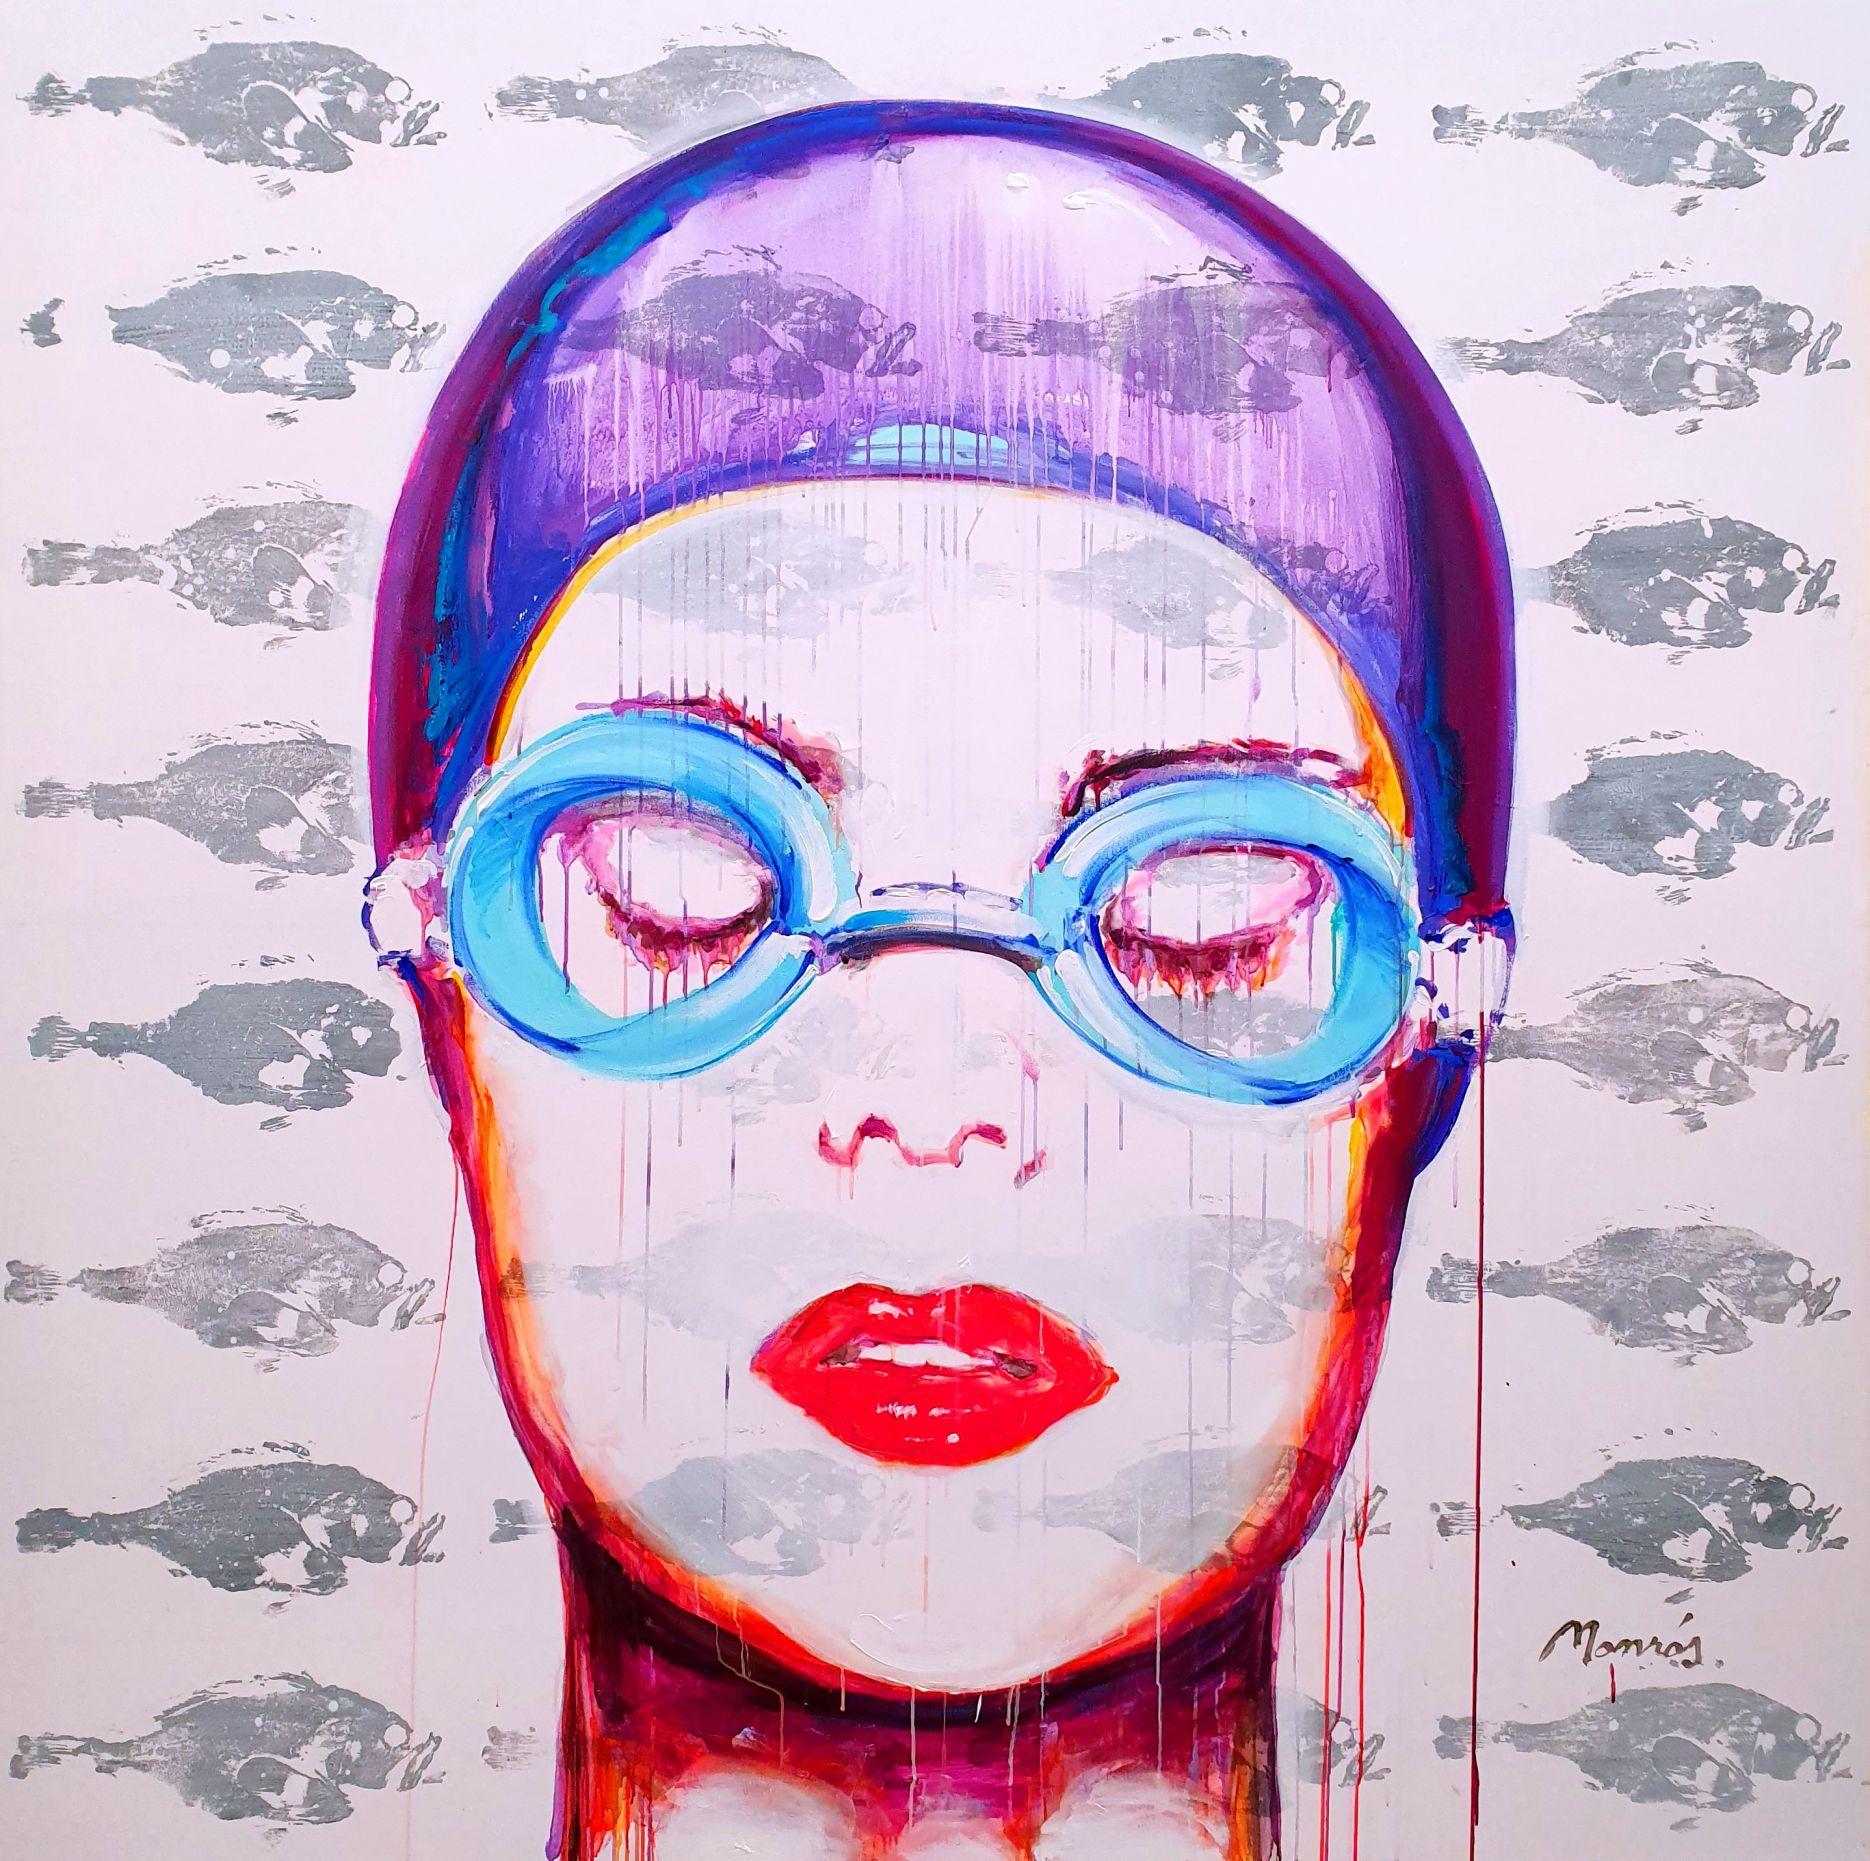 full mind (2020) - David Monrós